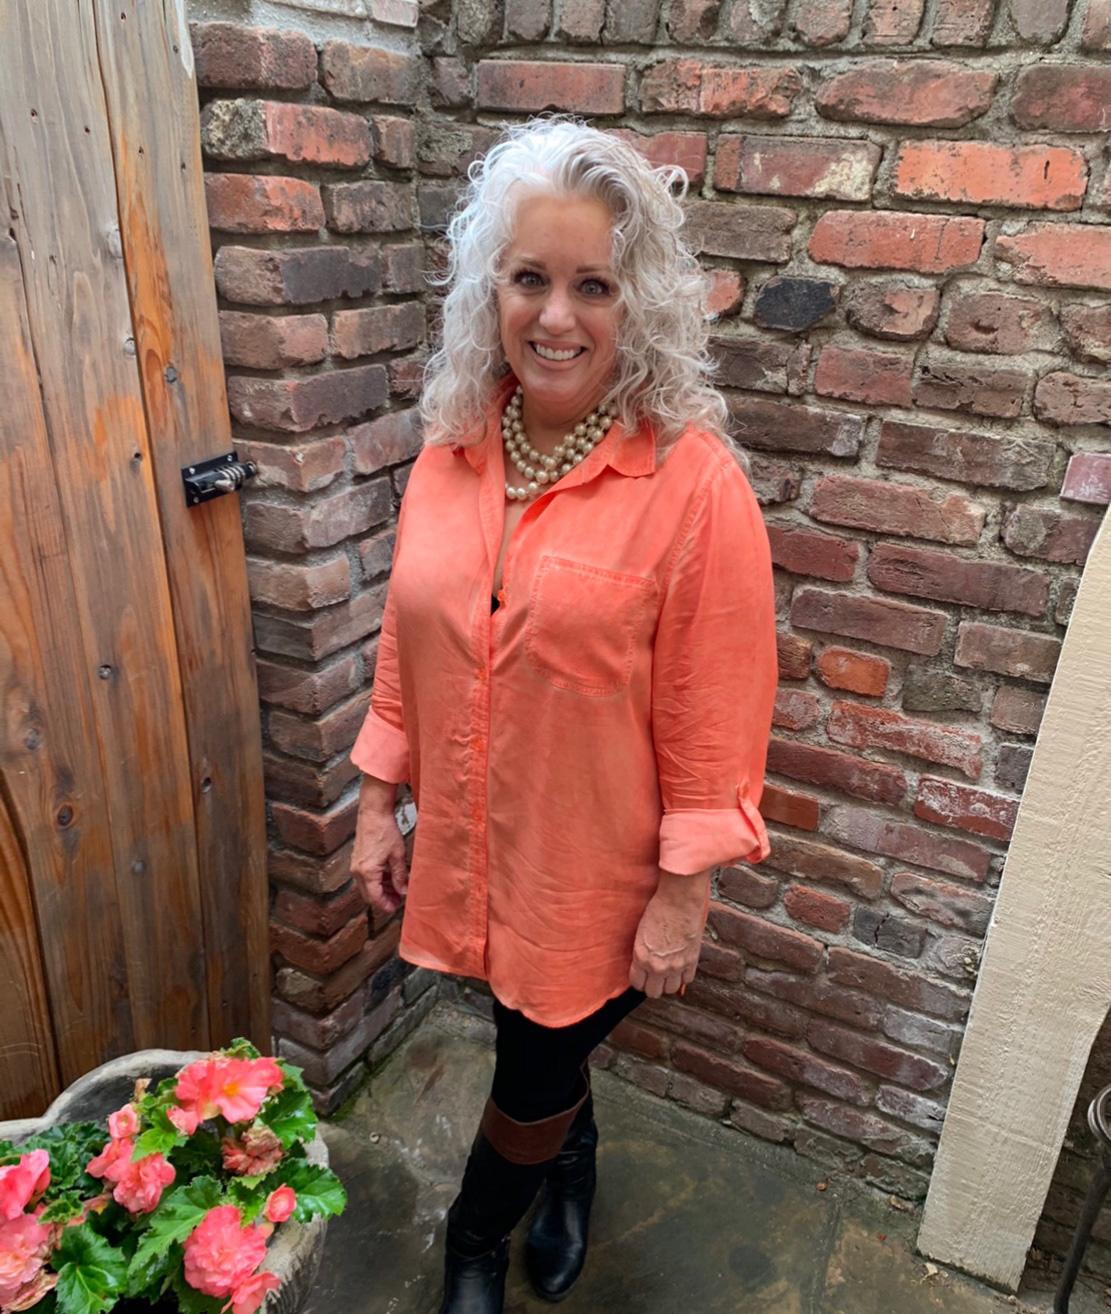 susan remey dakis in orange tunic